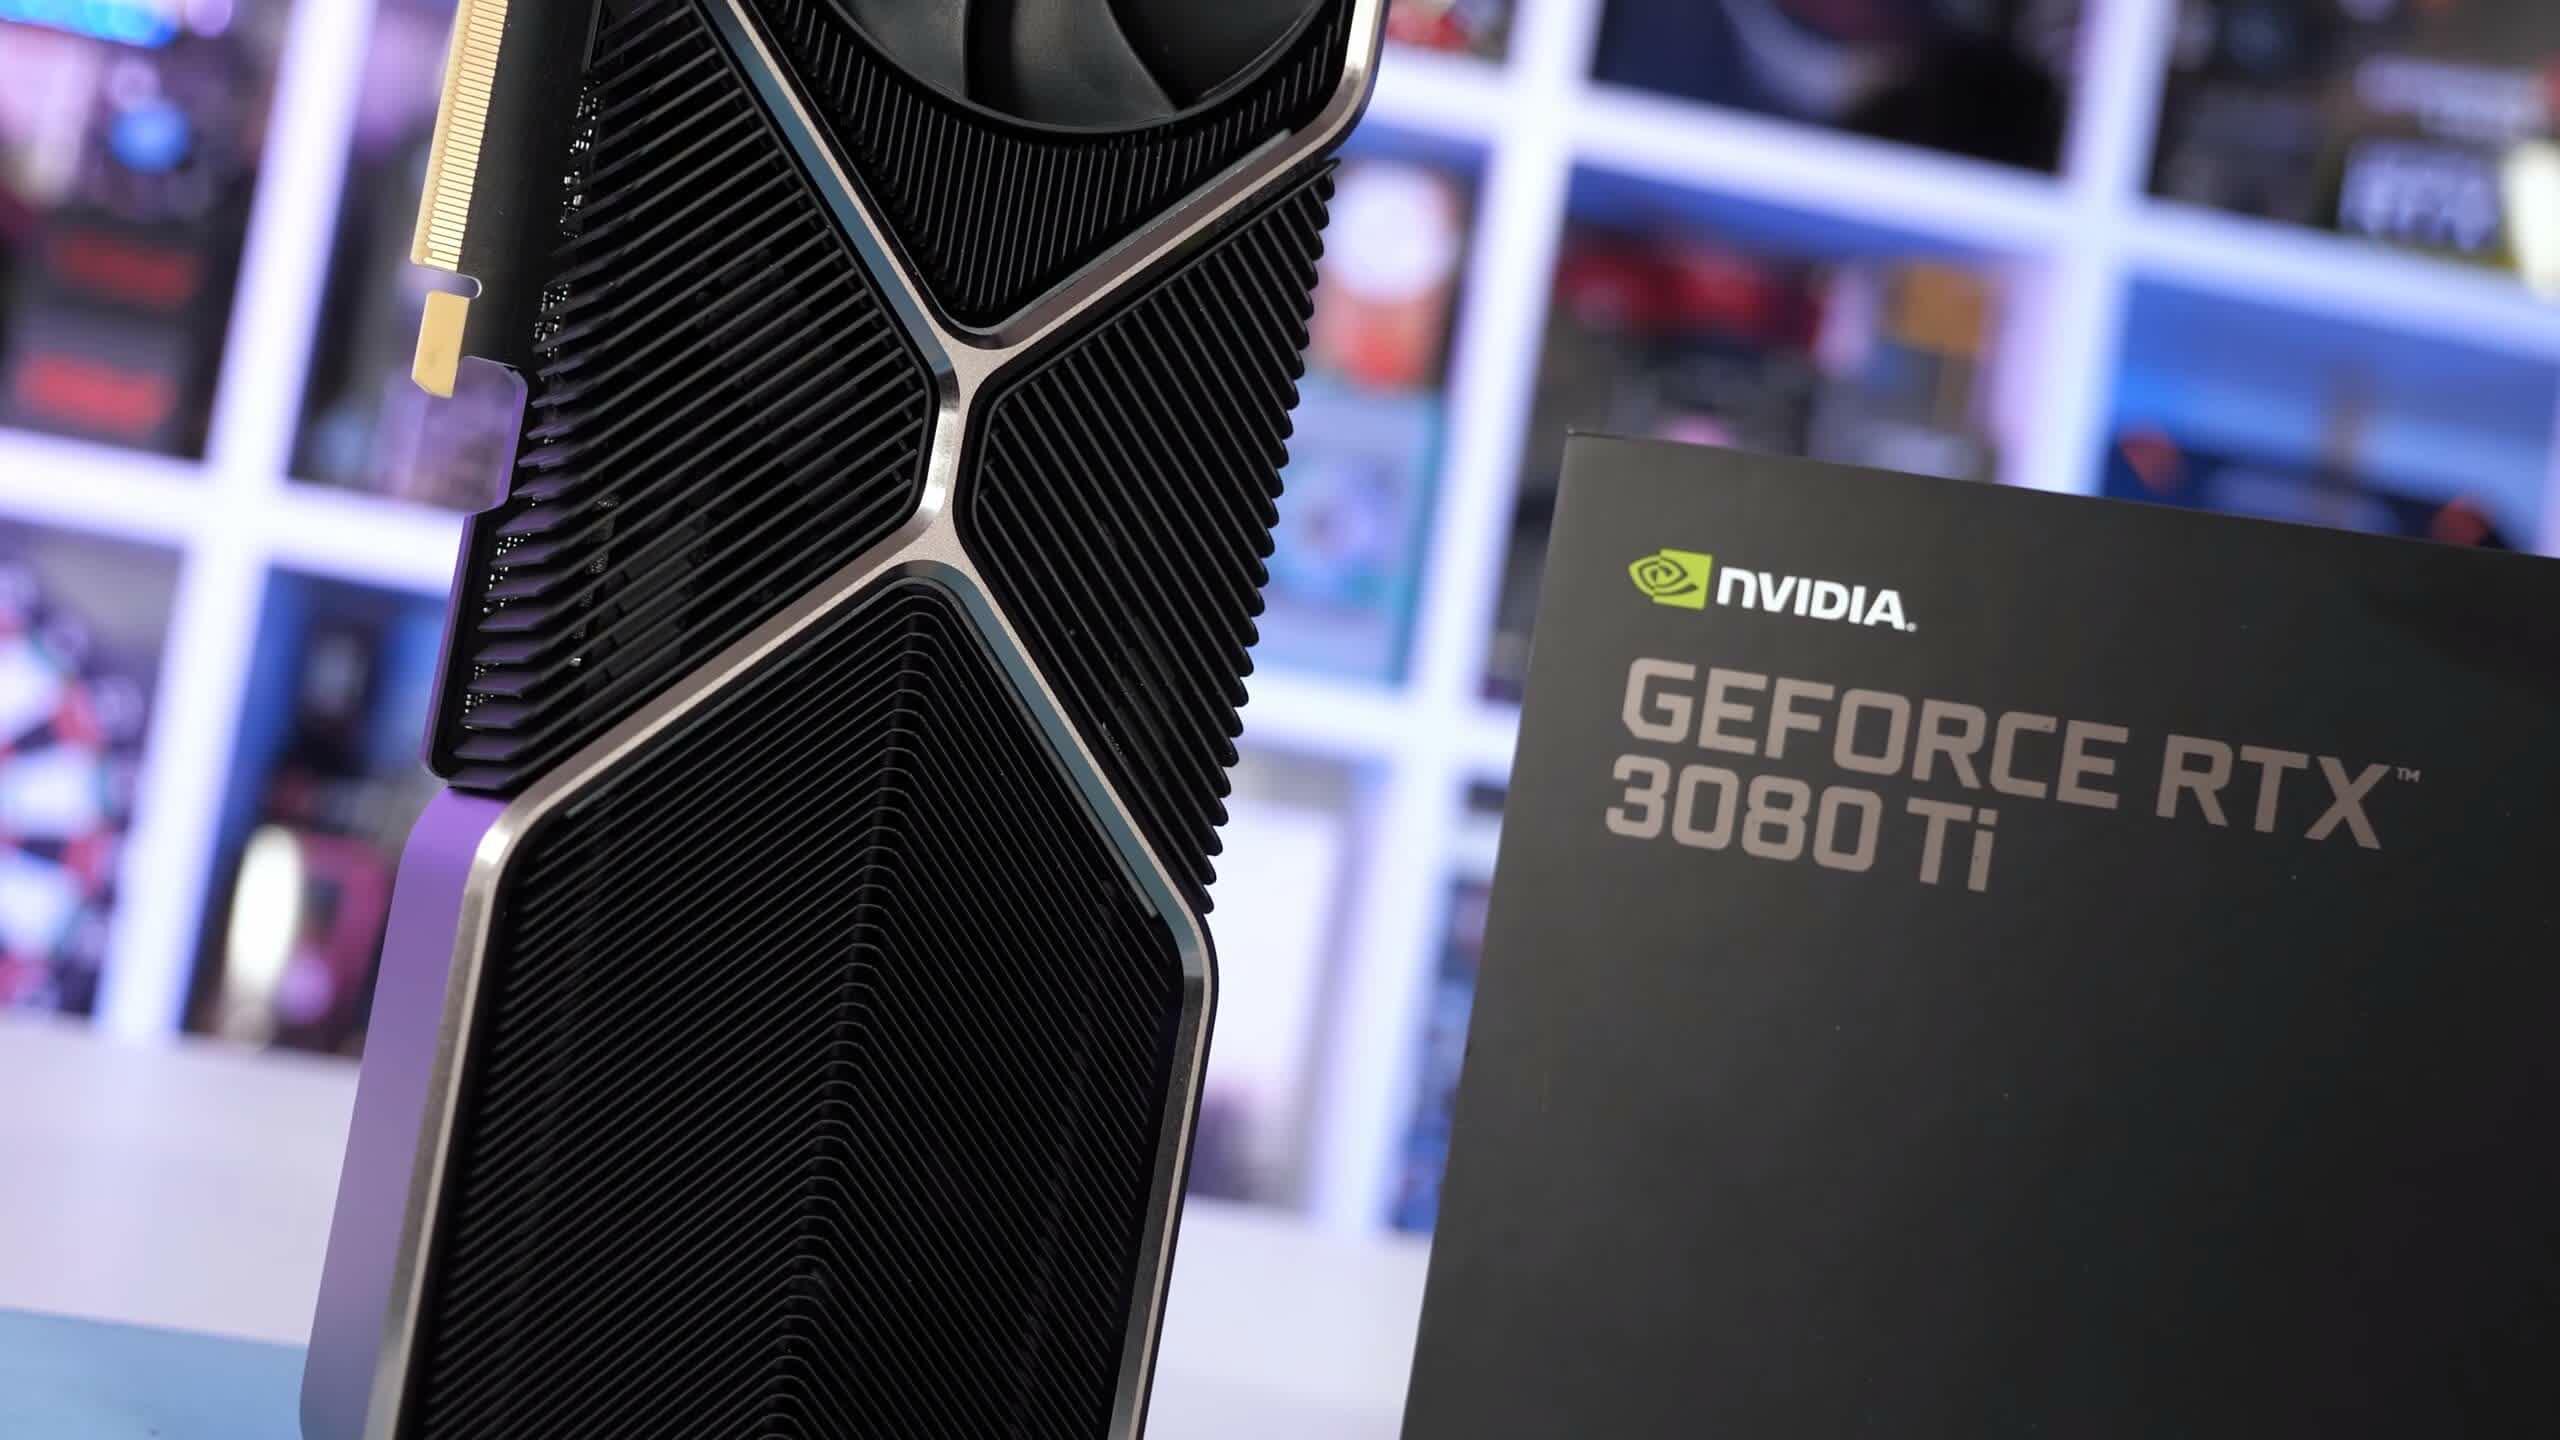 1633605743 178 GeForce RTX 3080 Ti contre Radeon RX 6800 XT